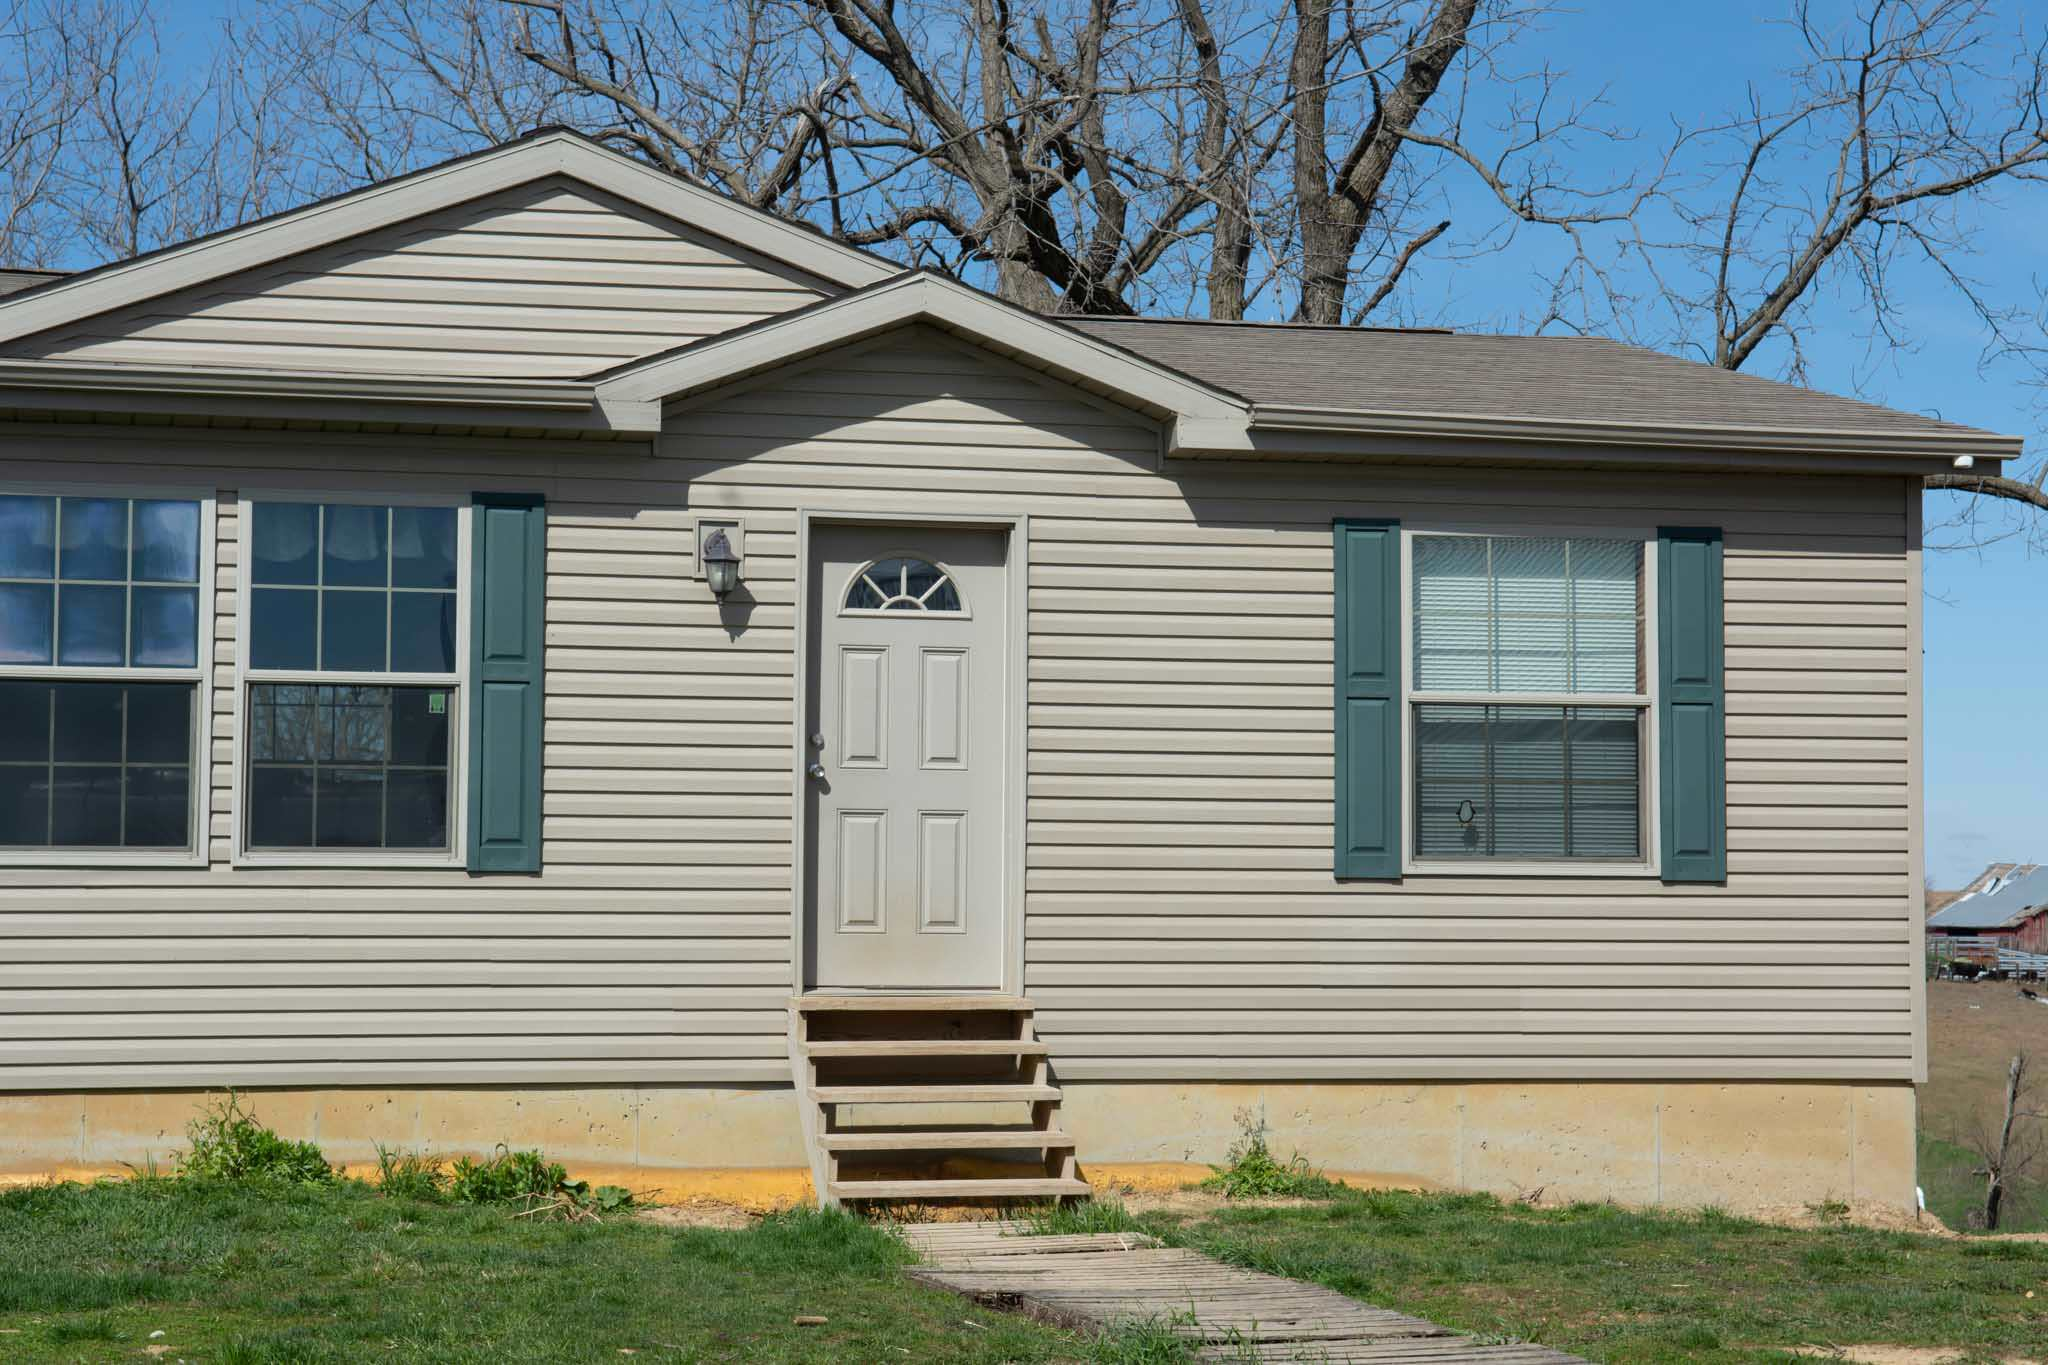 4206 210TH Property Photo - Clinton, IA real estate listing